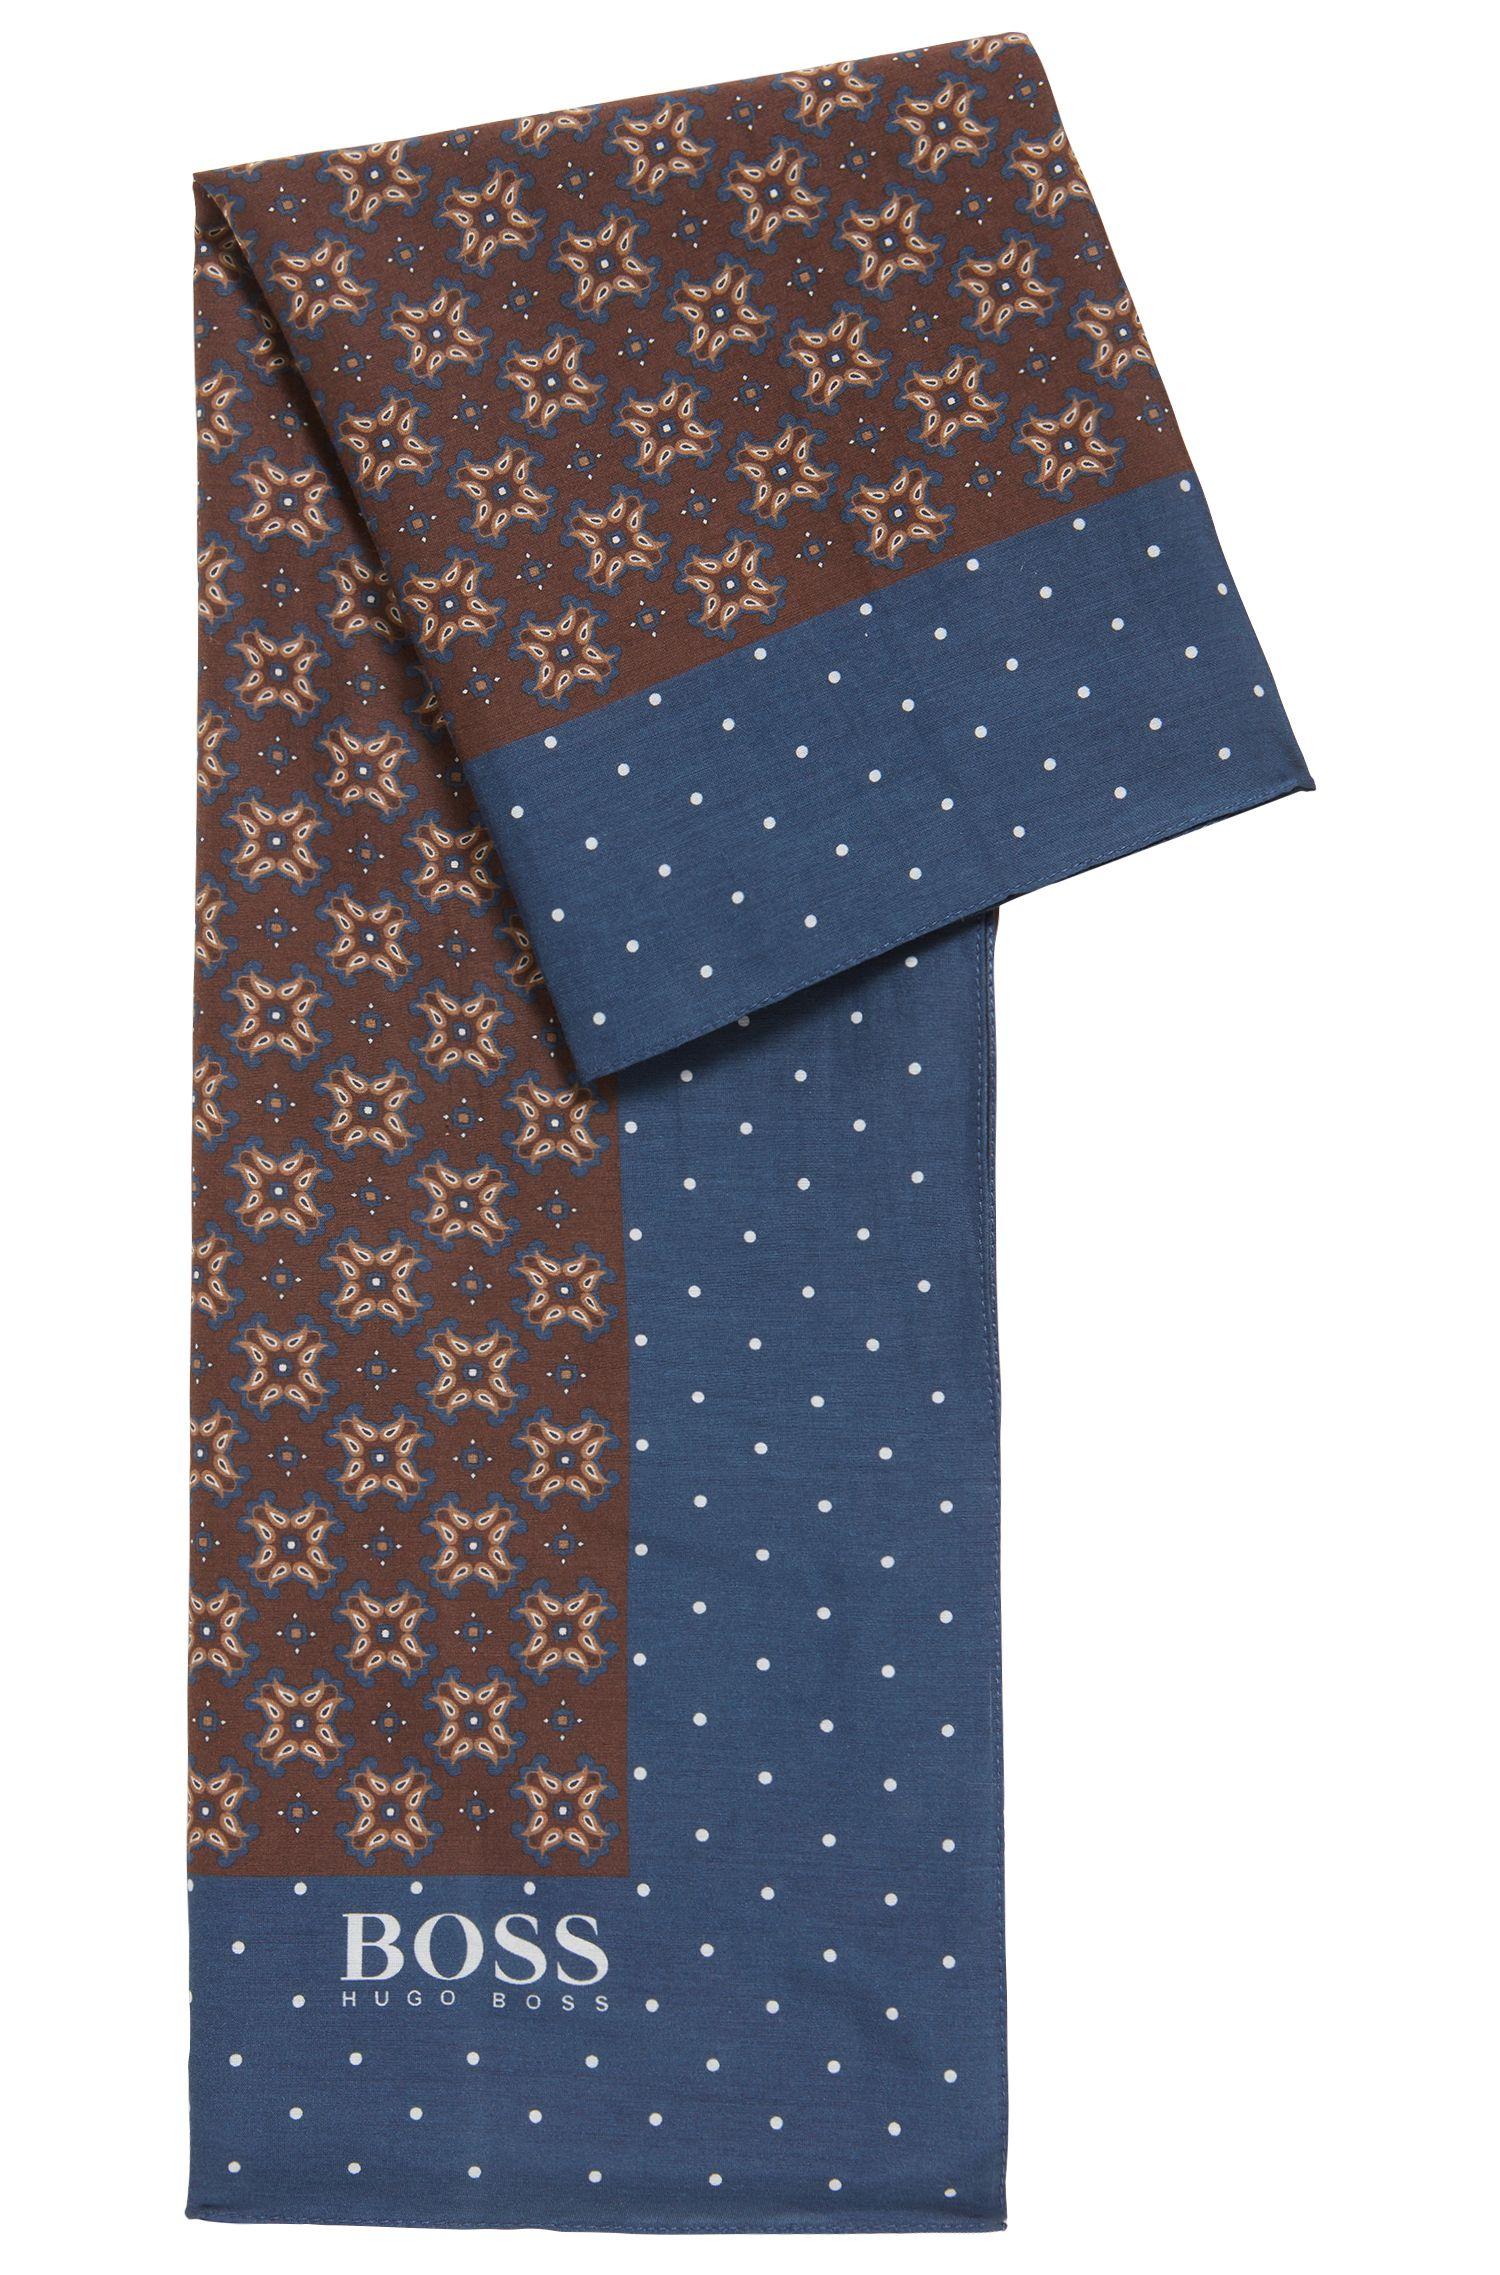 Fular estampado de inspiración tradicional en algodón con seda, Marrón oscuro